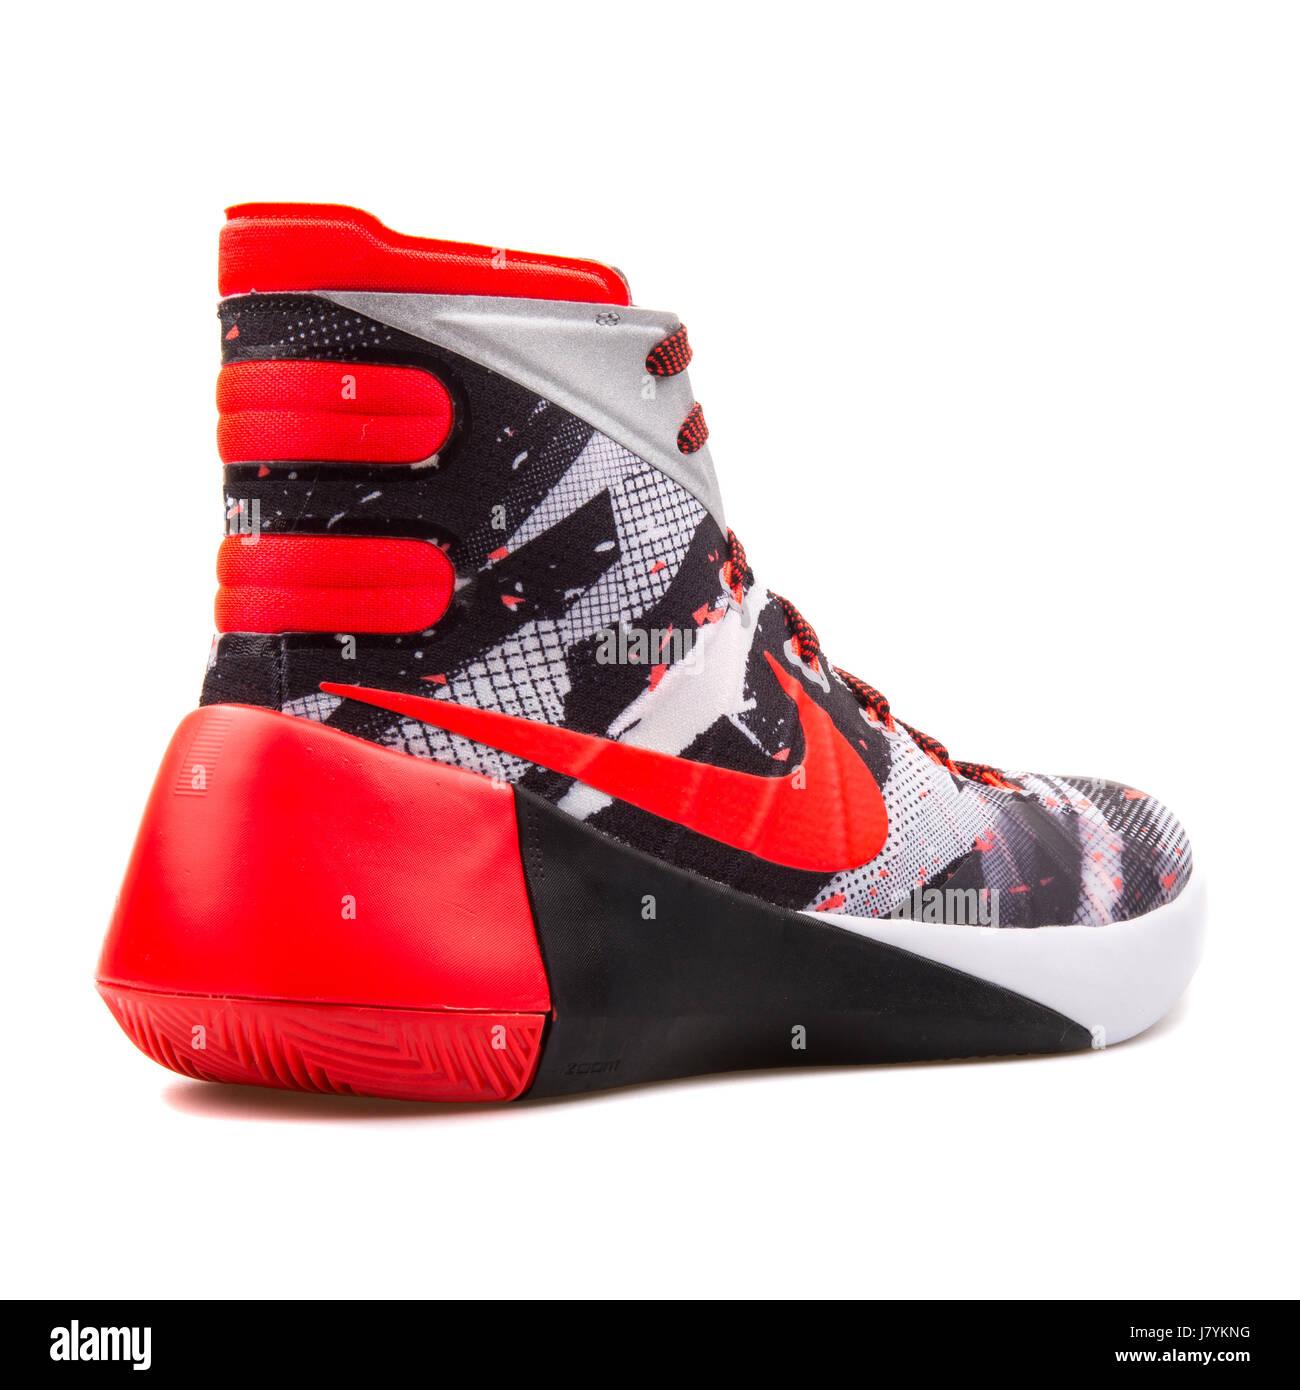 newest 4b1a9 01295 Nike Hyperdunk 2015 PRM Men s Basketball Sneakers - 749567-160